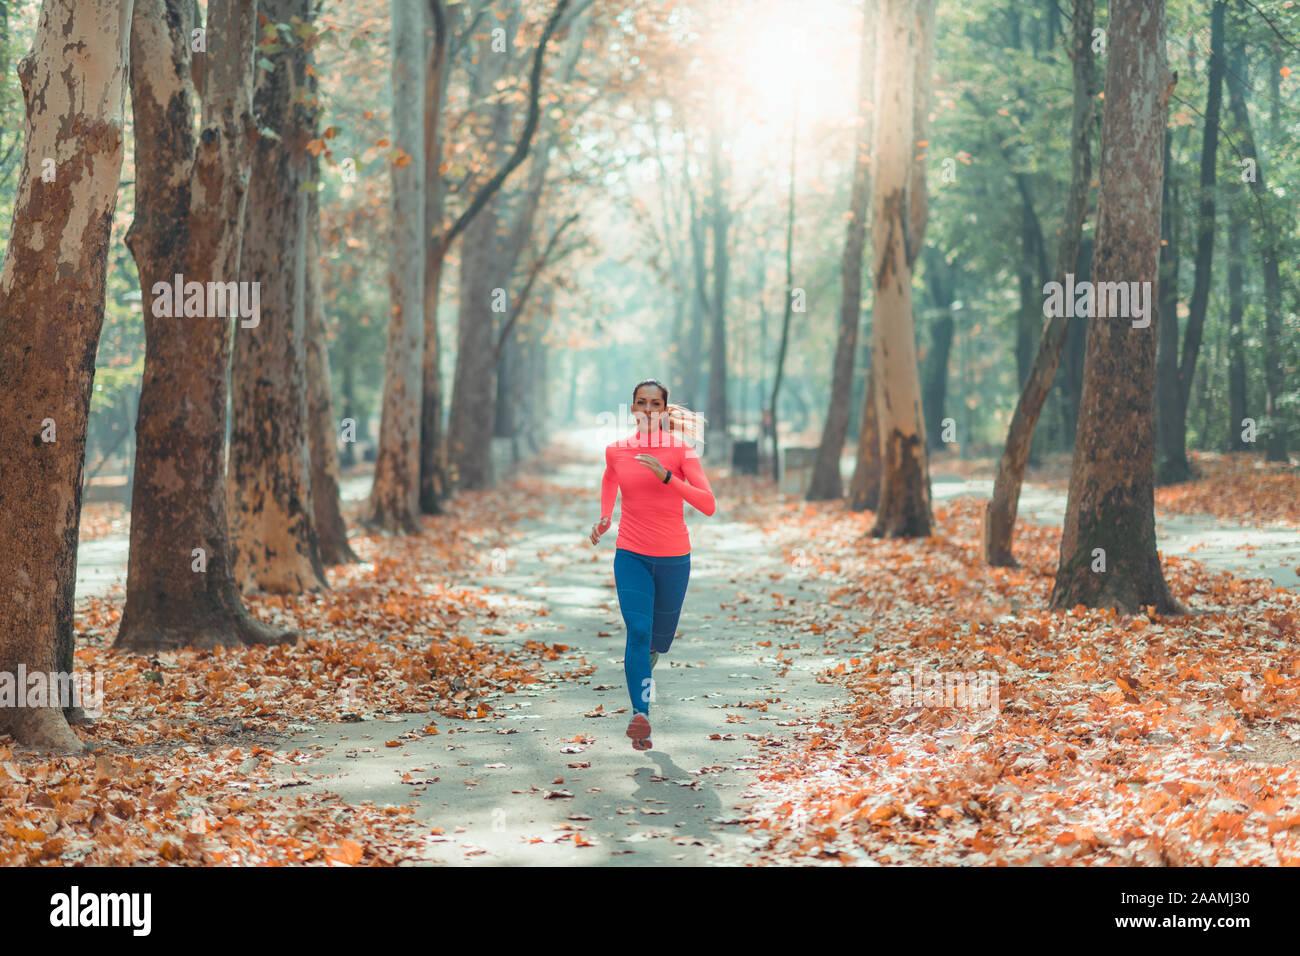 Frau in einem Park Joggen Stockfoto